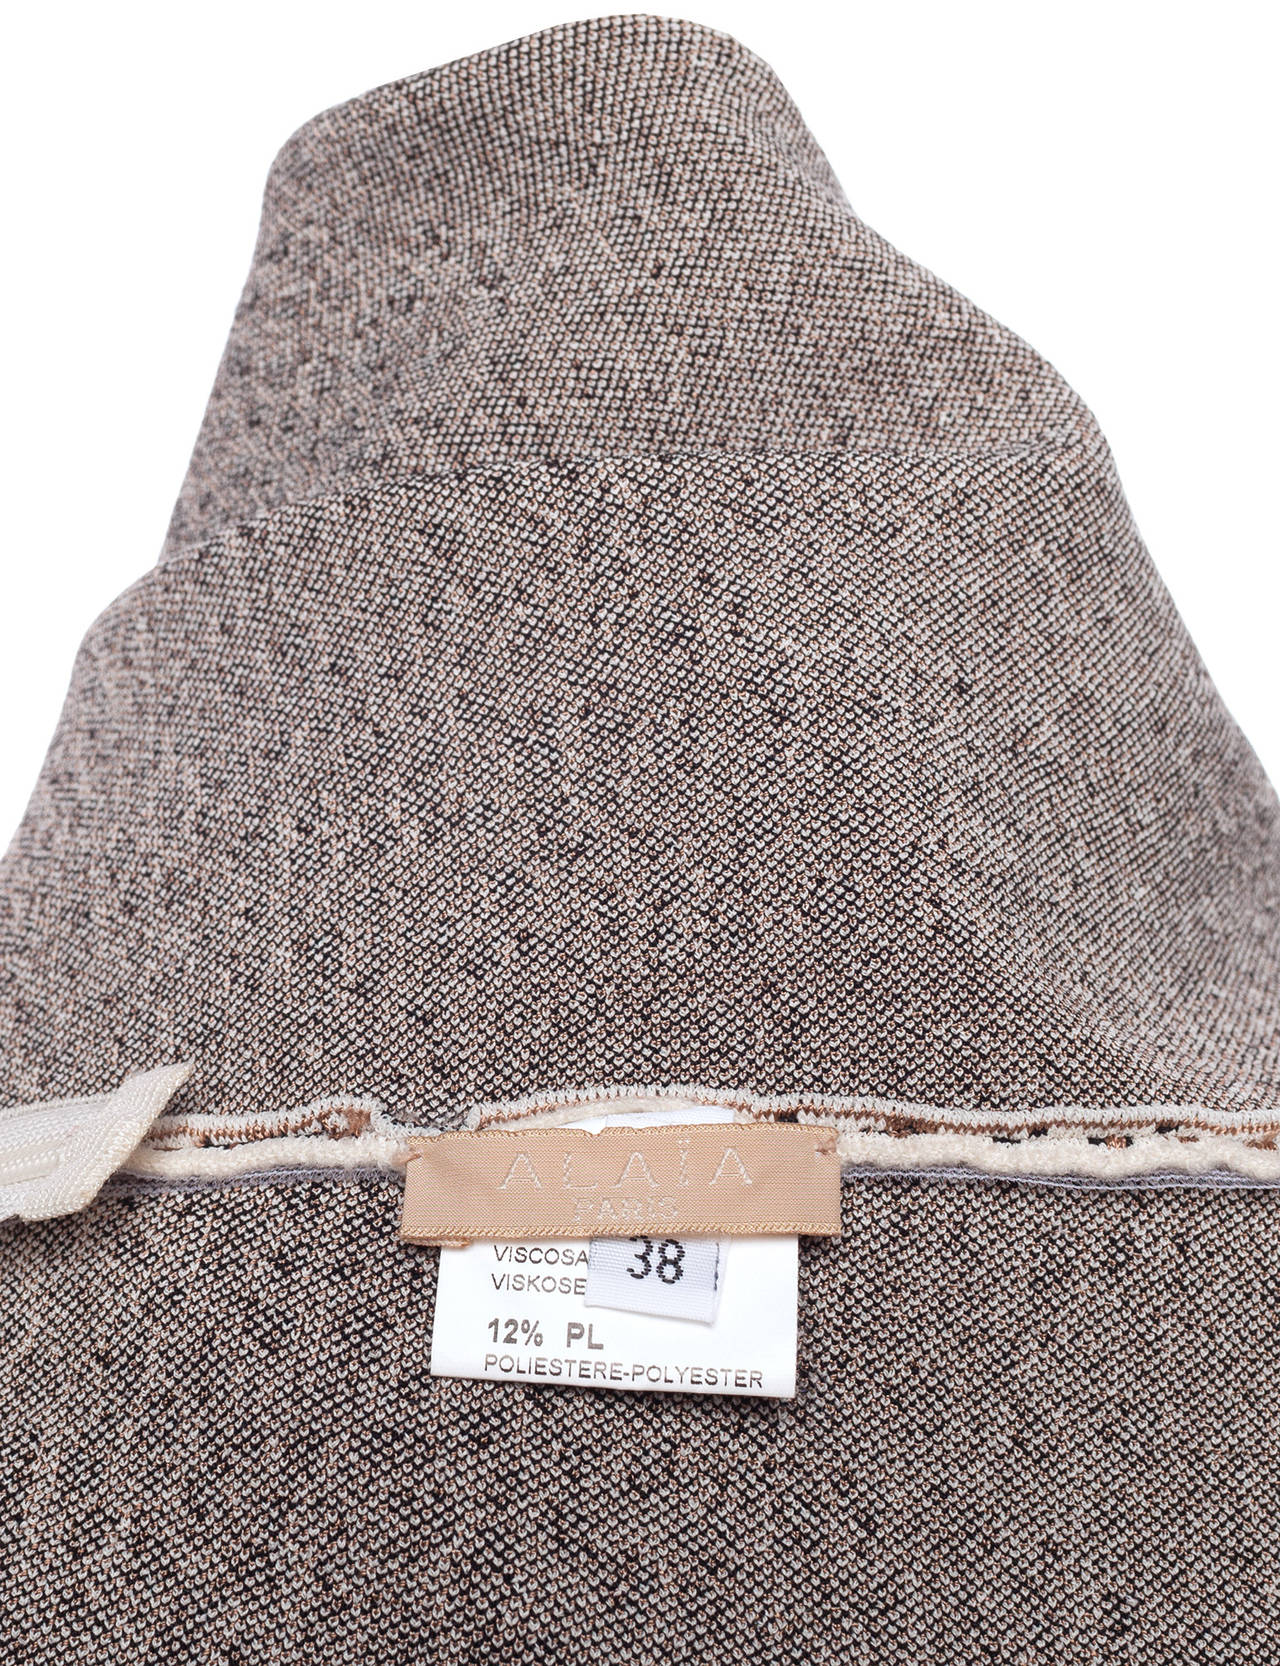 Knitted Shirt Pattern : 90s Alaia Paris aline knitted cheetah pattern skirt, Sz. M at 1stdibs